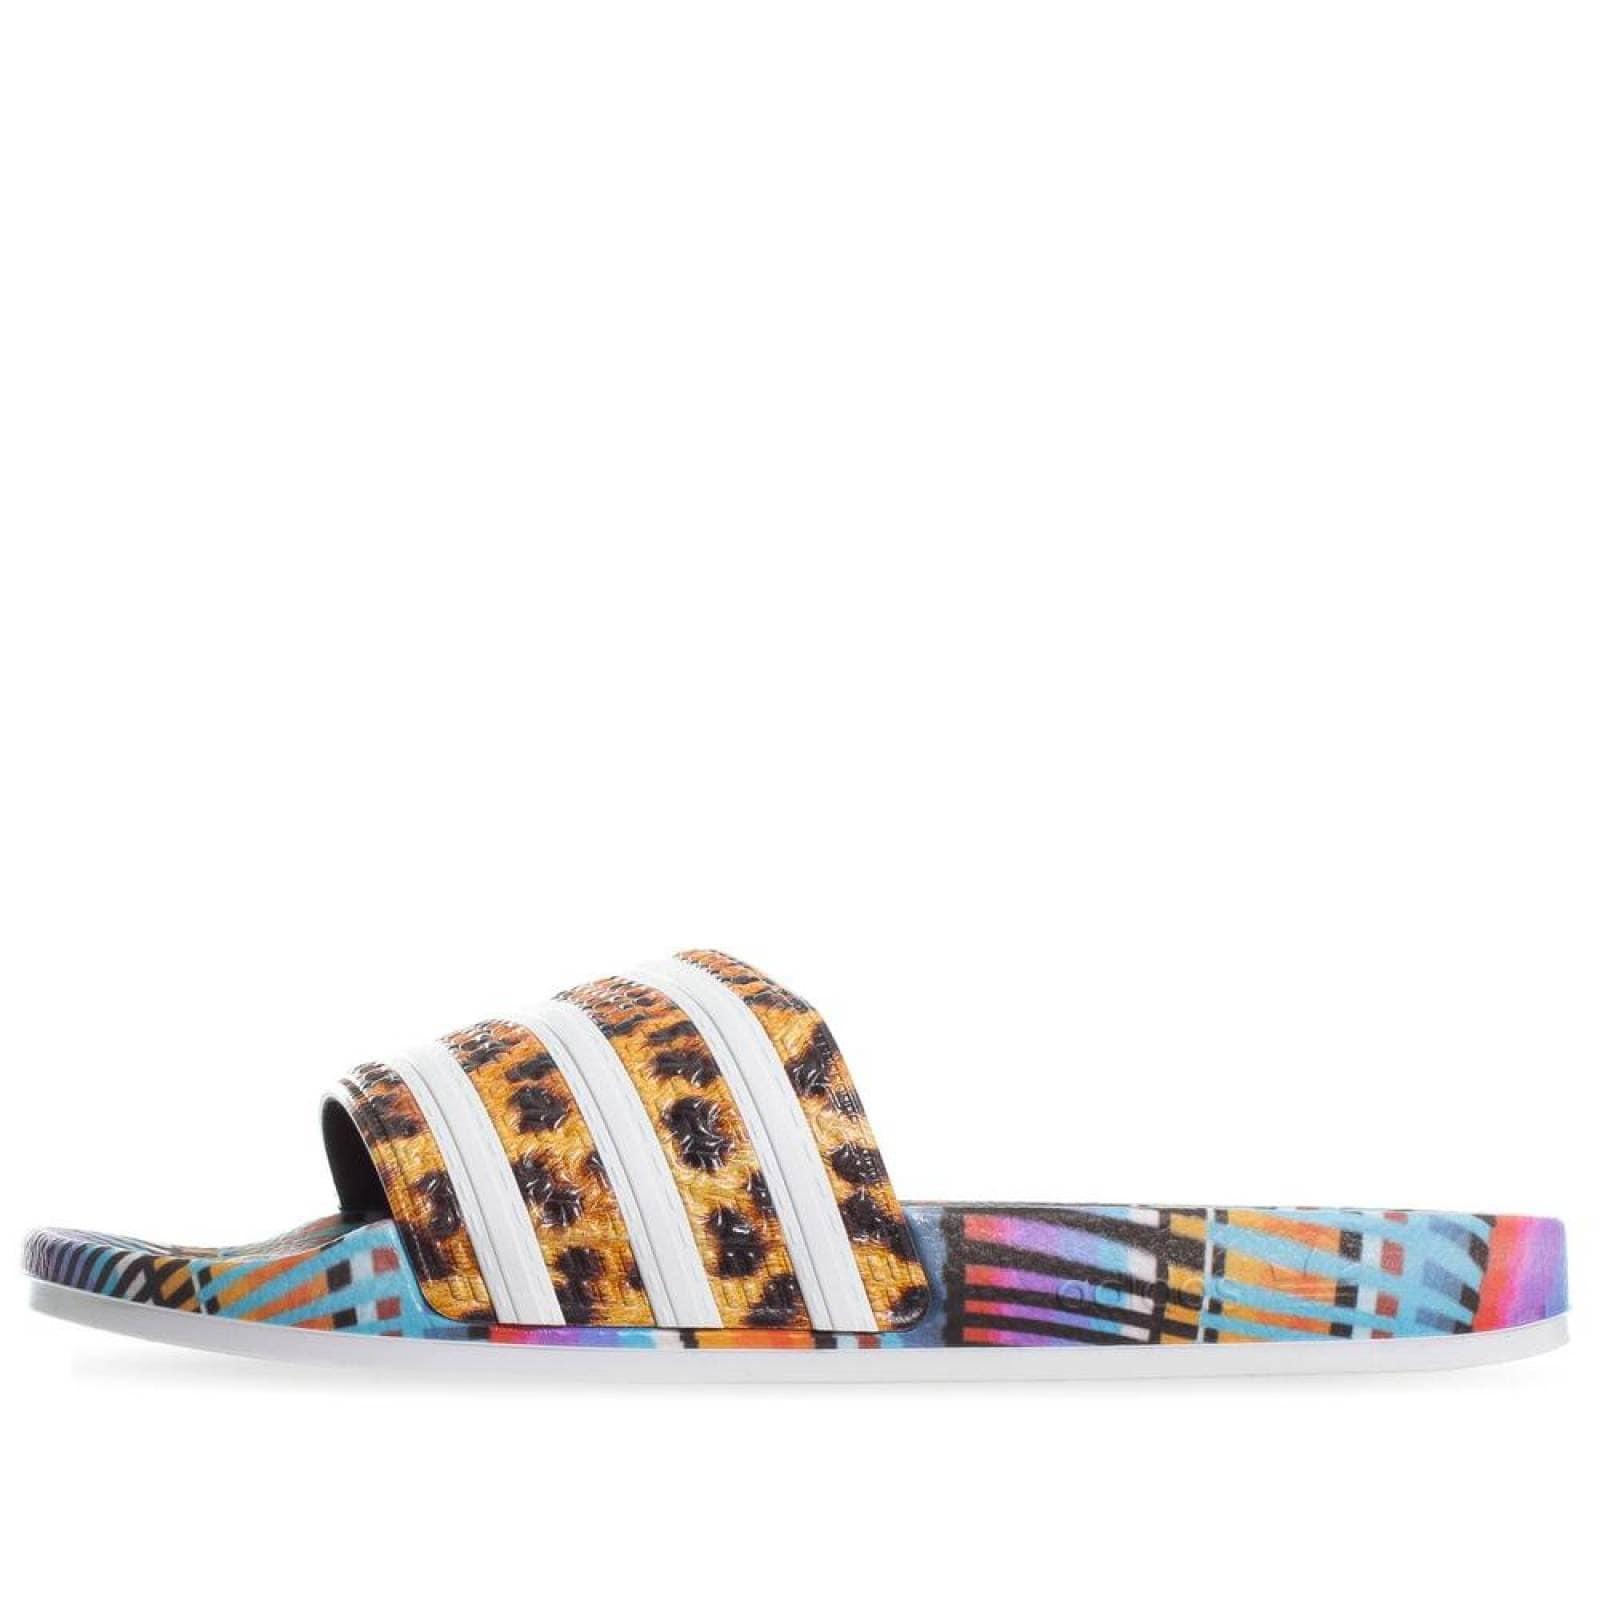 Sandalias Adidas Adilette W CM8223 Multicolor Mujer